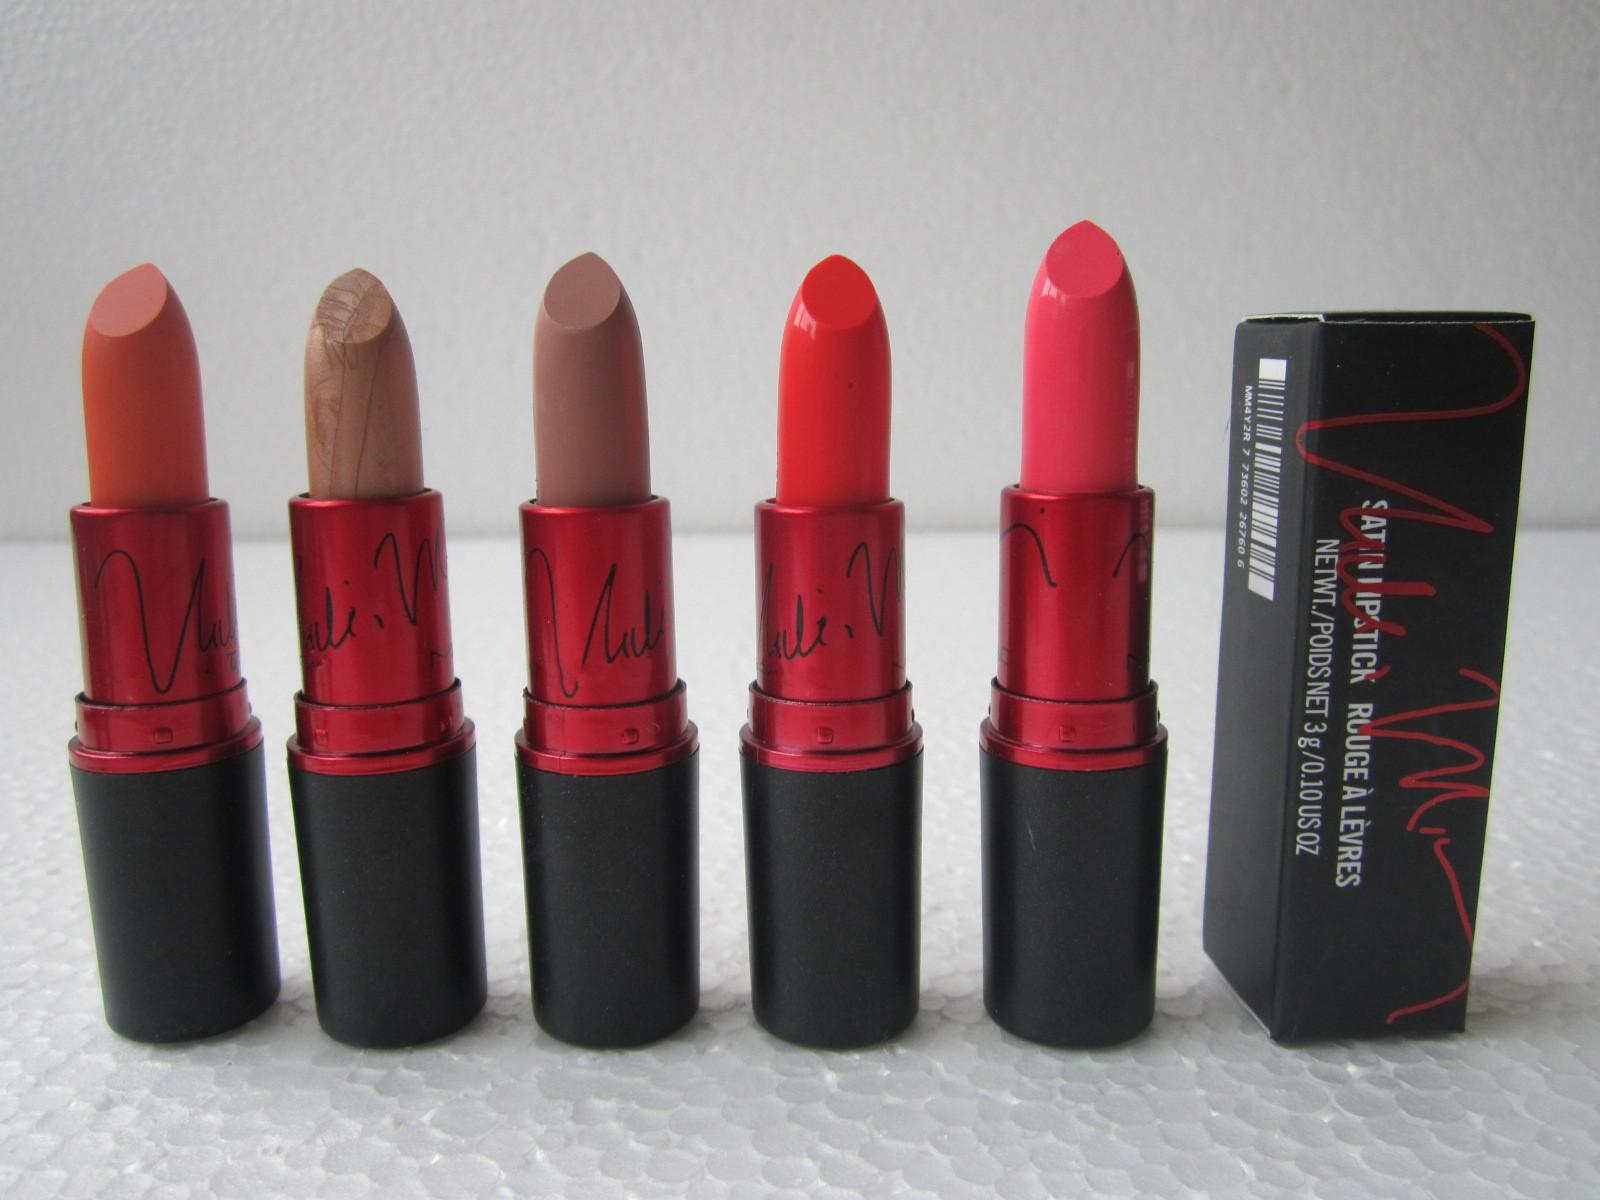 12 stks / partijen Make-up glans Lipstick 3G met Engelse naam